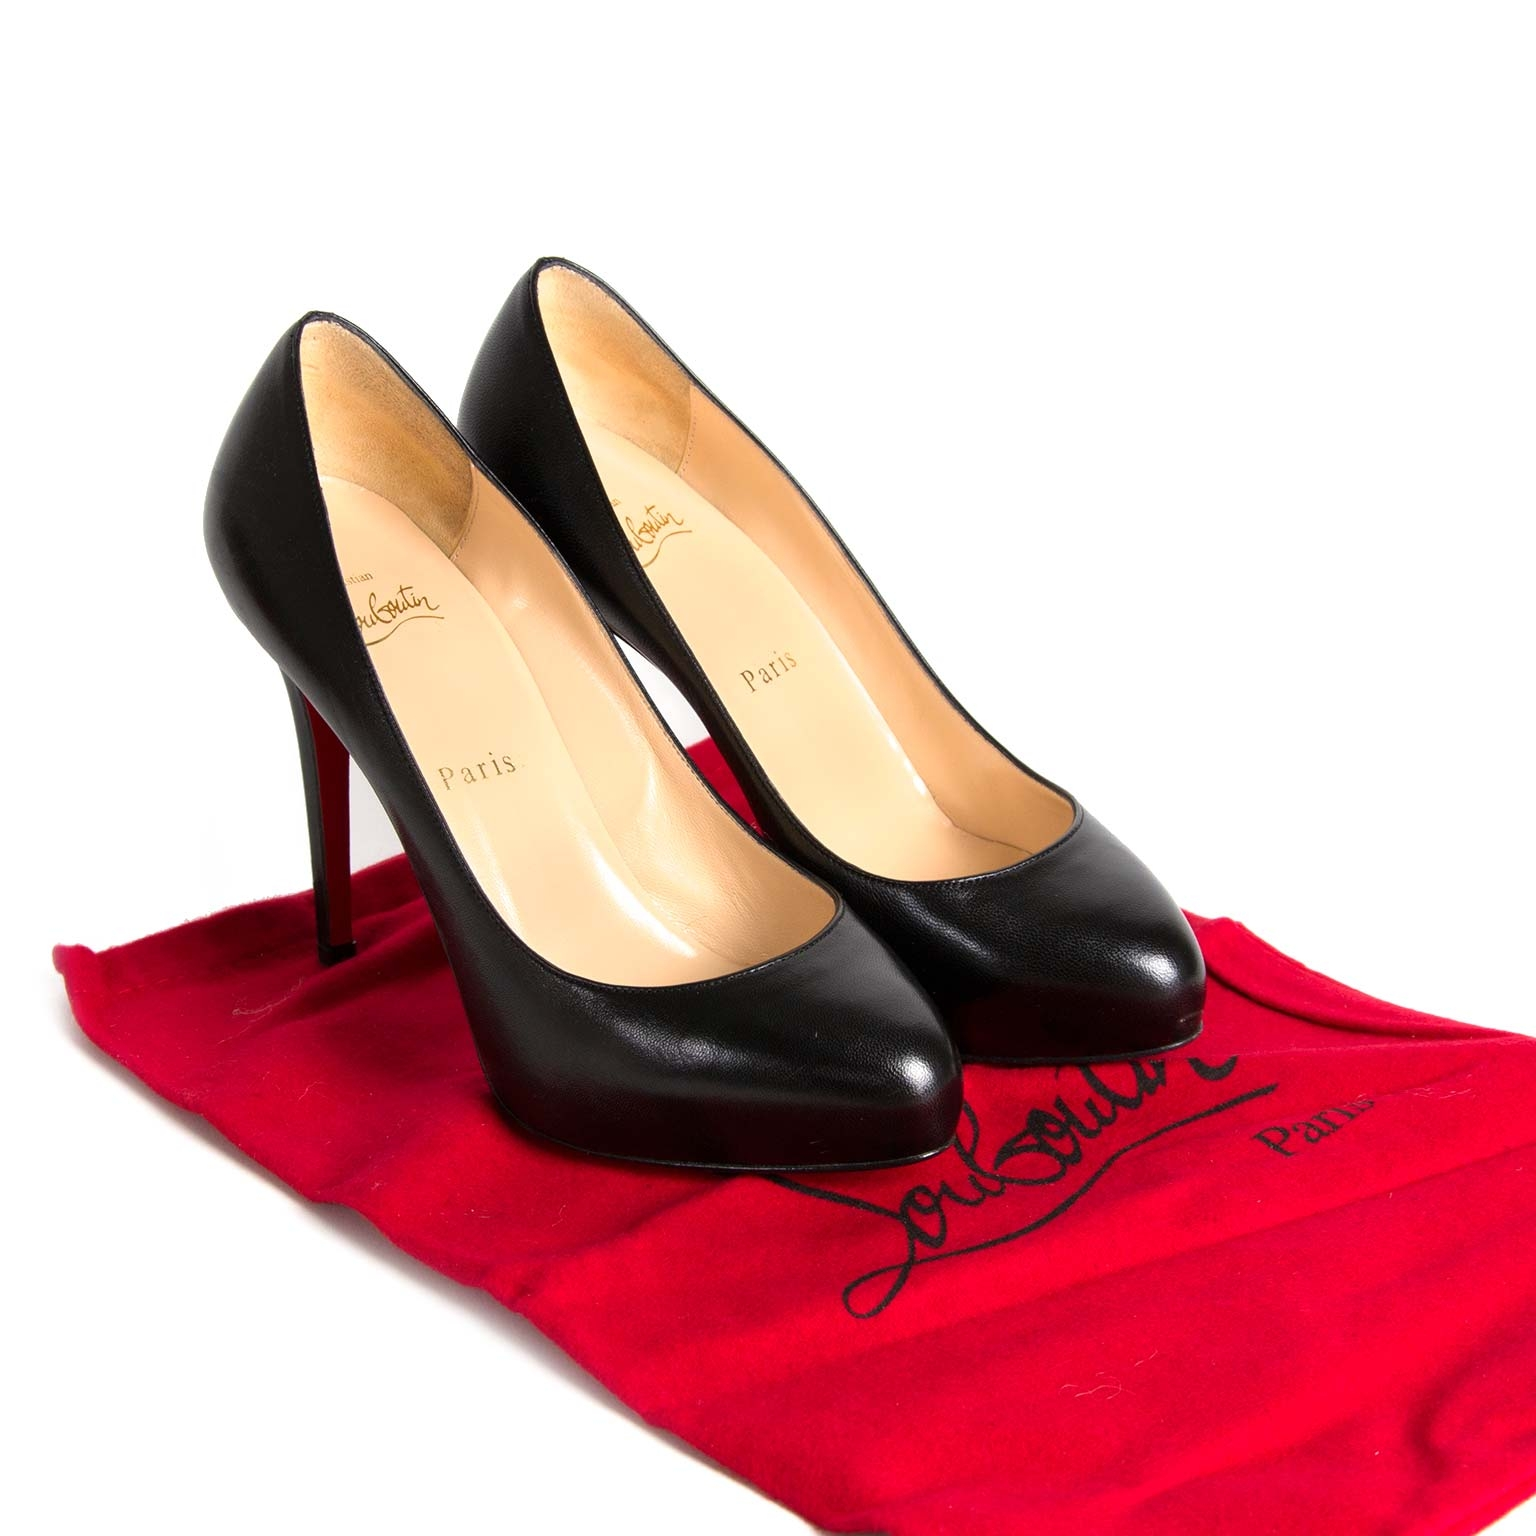 3fa952b0d28f ... koop Christian Louboutin Black Simple Pump - Size 37 bij labellov aan  de beste prijs